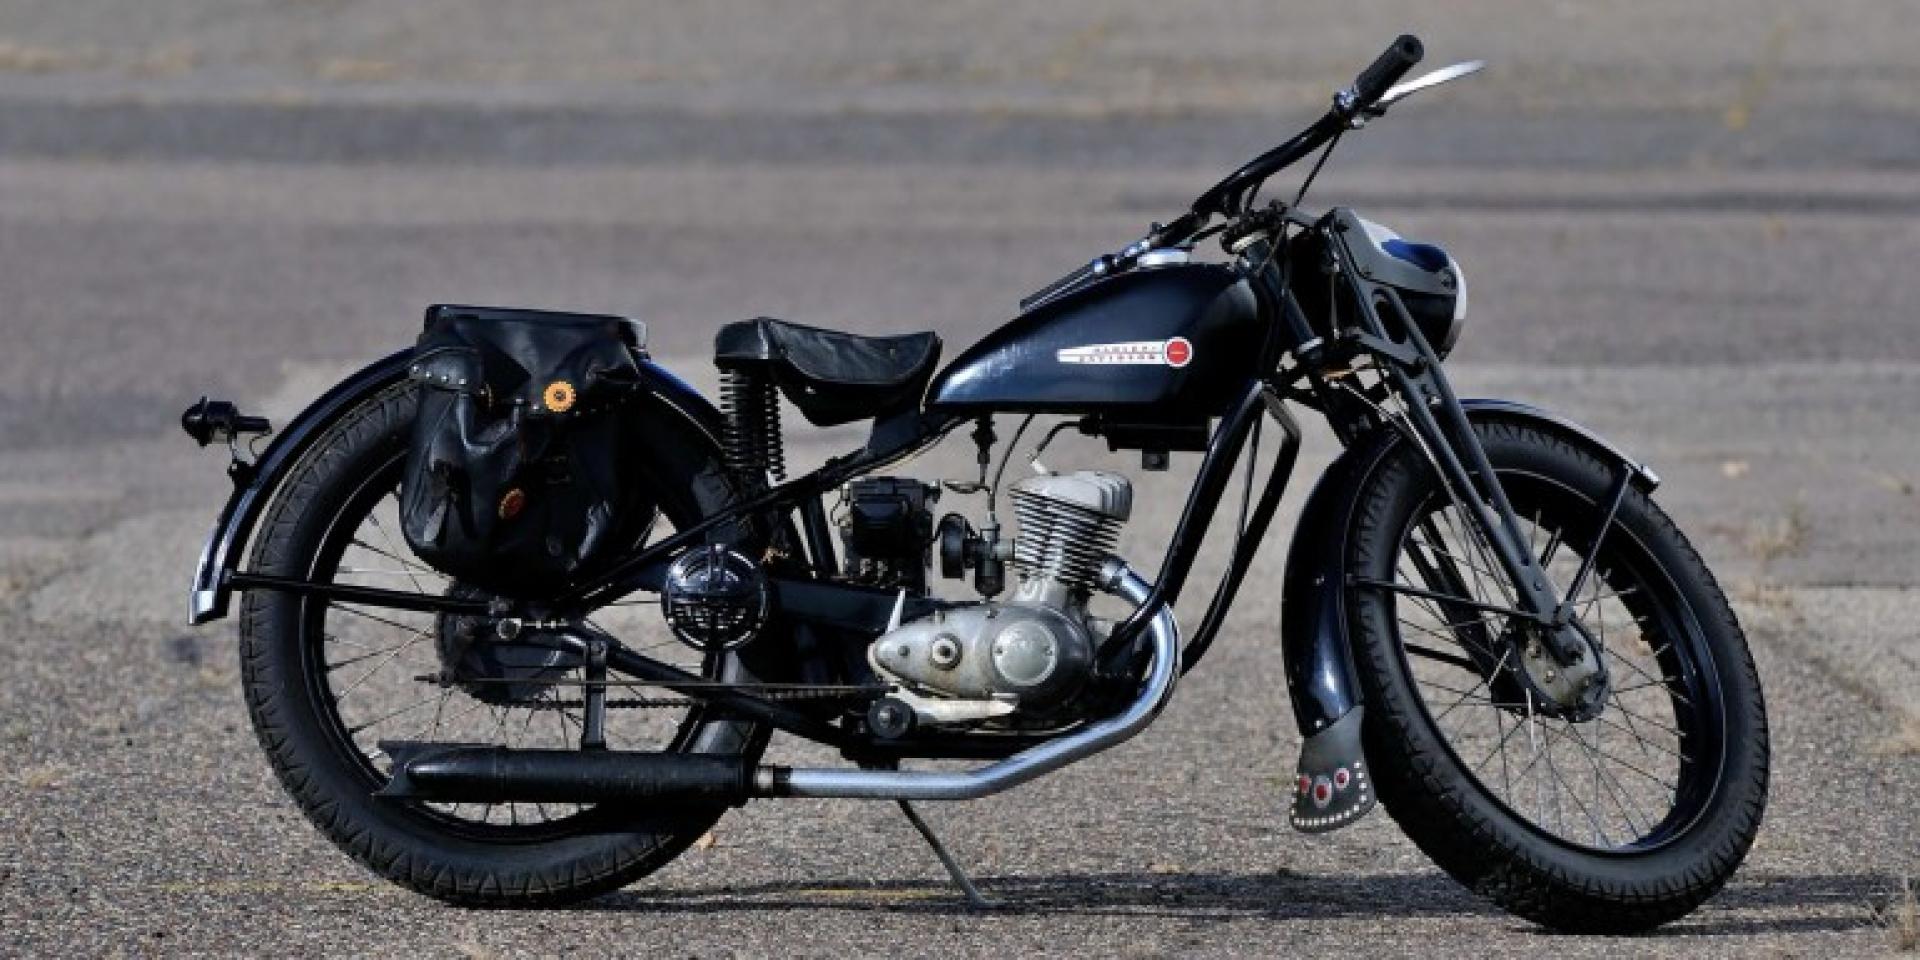 Harley-Davidson狂想曲。八台超乎想像的哈雷機車!